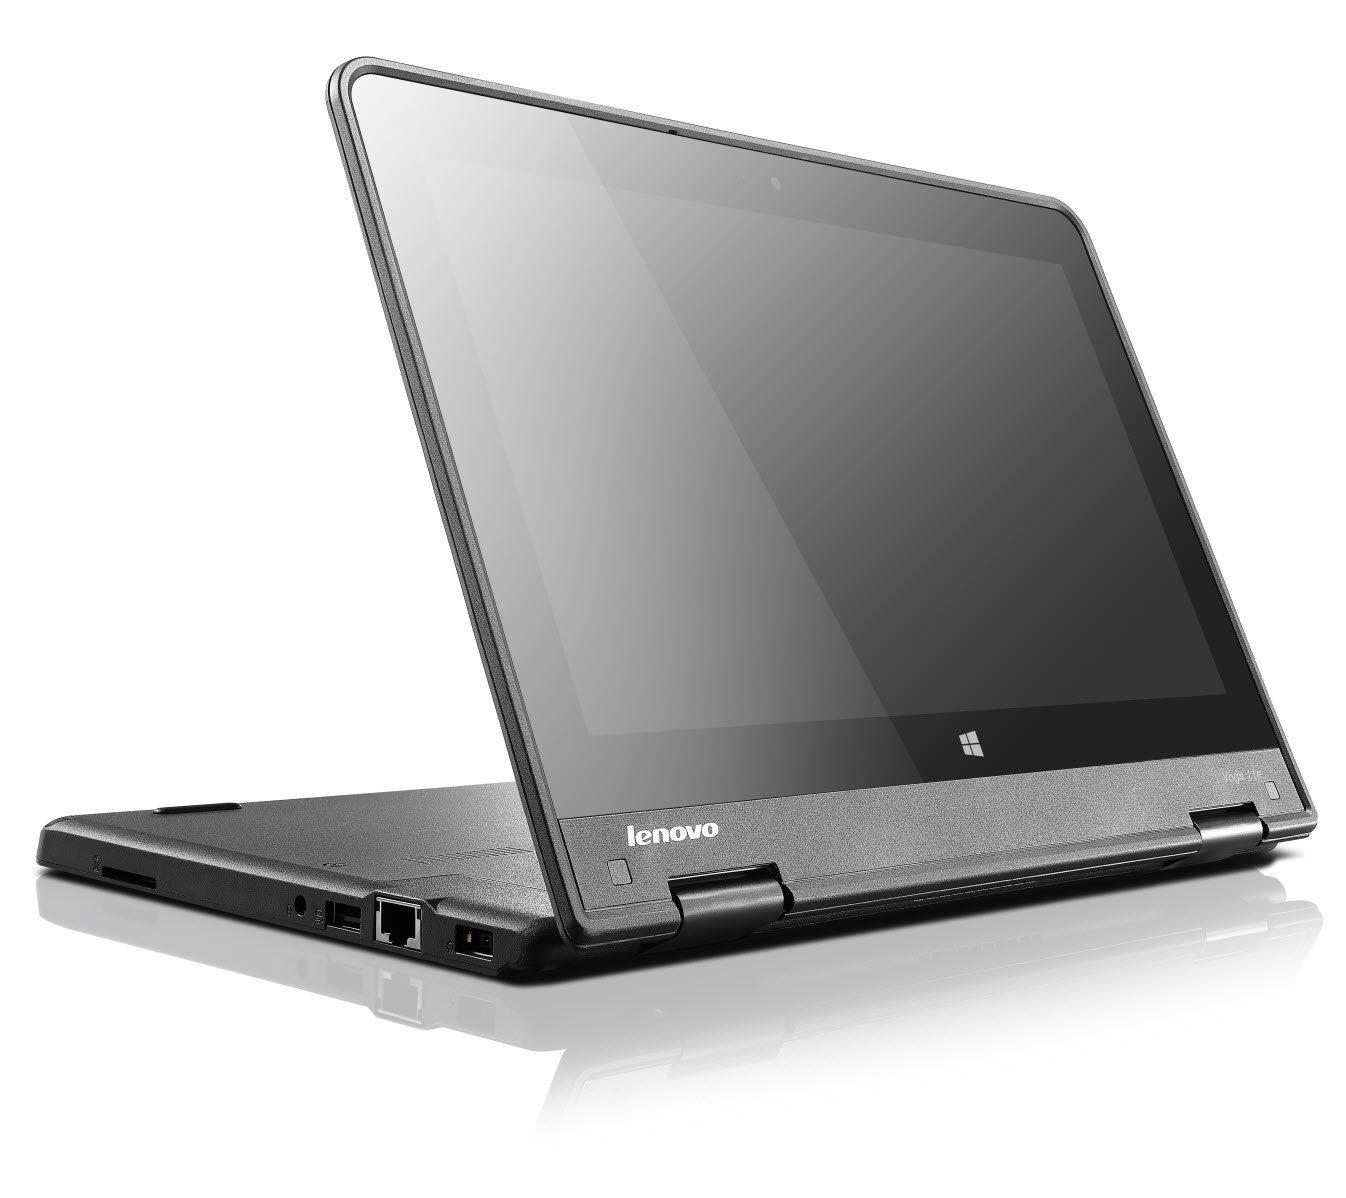 Lenovo Thinkpad Yoga 11E Premium High Performance 11.6 IPS Touchscreen Convertible 2-in-1 Laptop, Intel Core M-5Y10c up to 2 GHz, 4GB RAM, 128GB SSD, WiFi, Bluetooth, HDMI, Webcam, Win 10 Pro